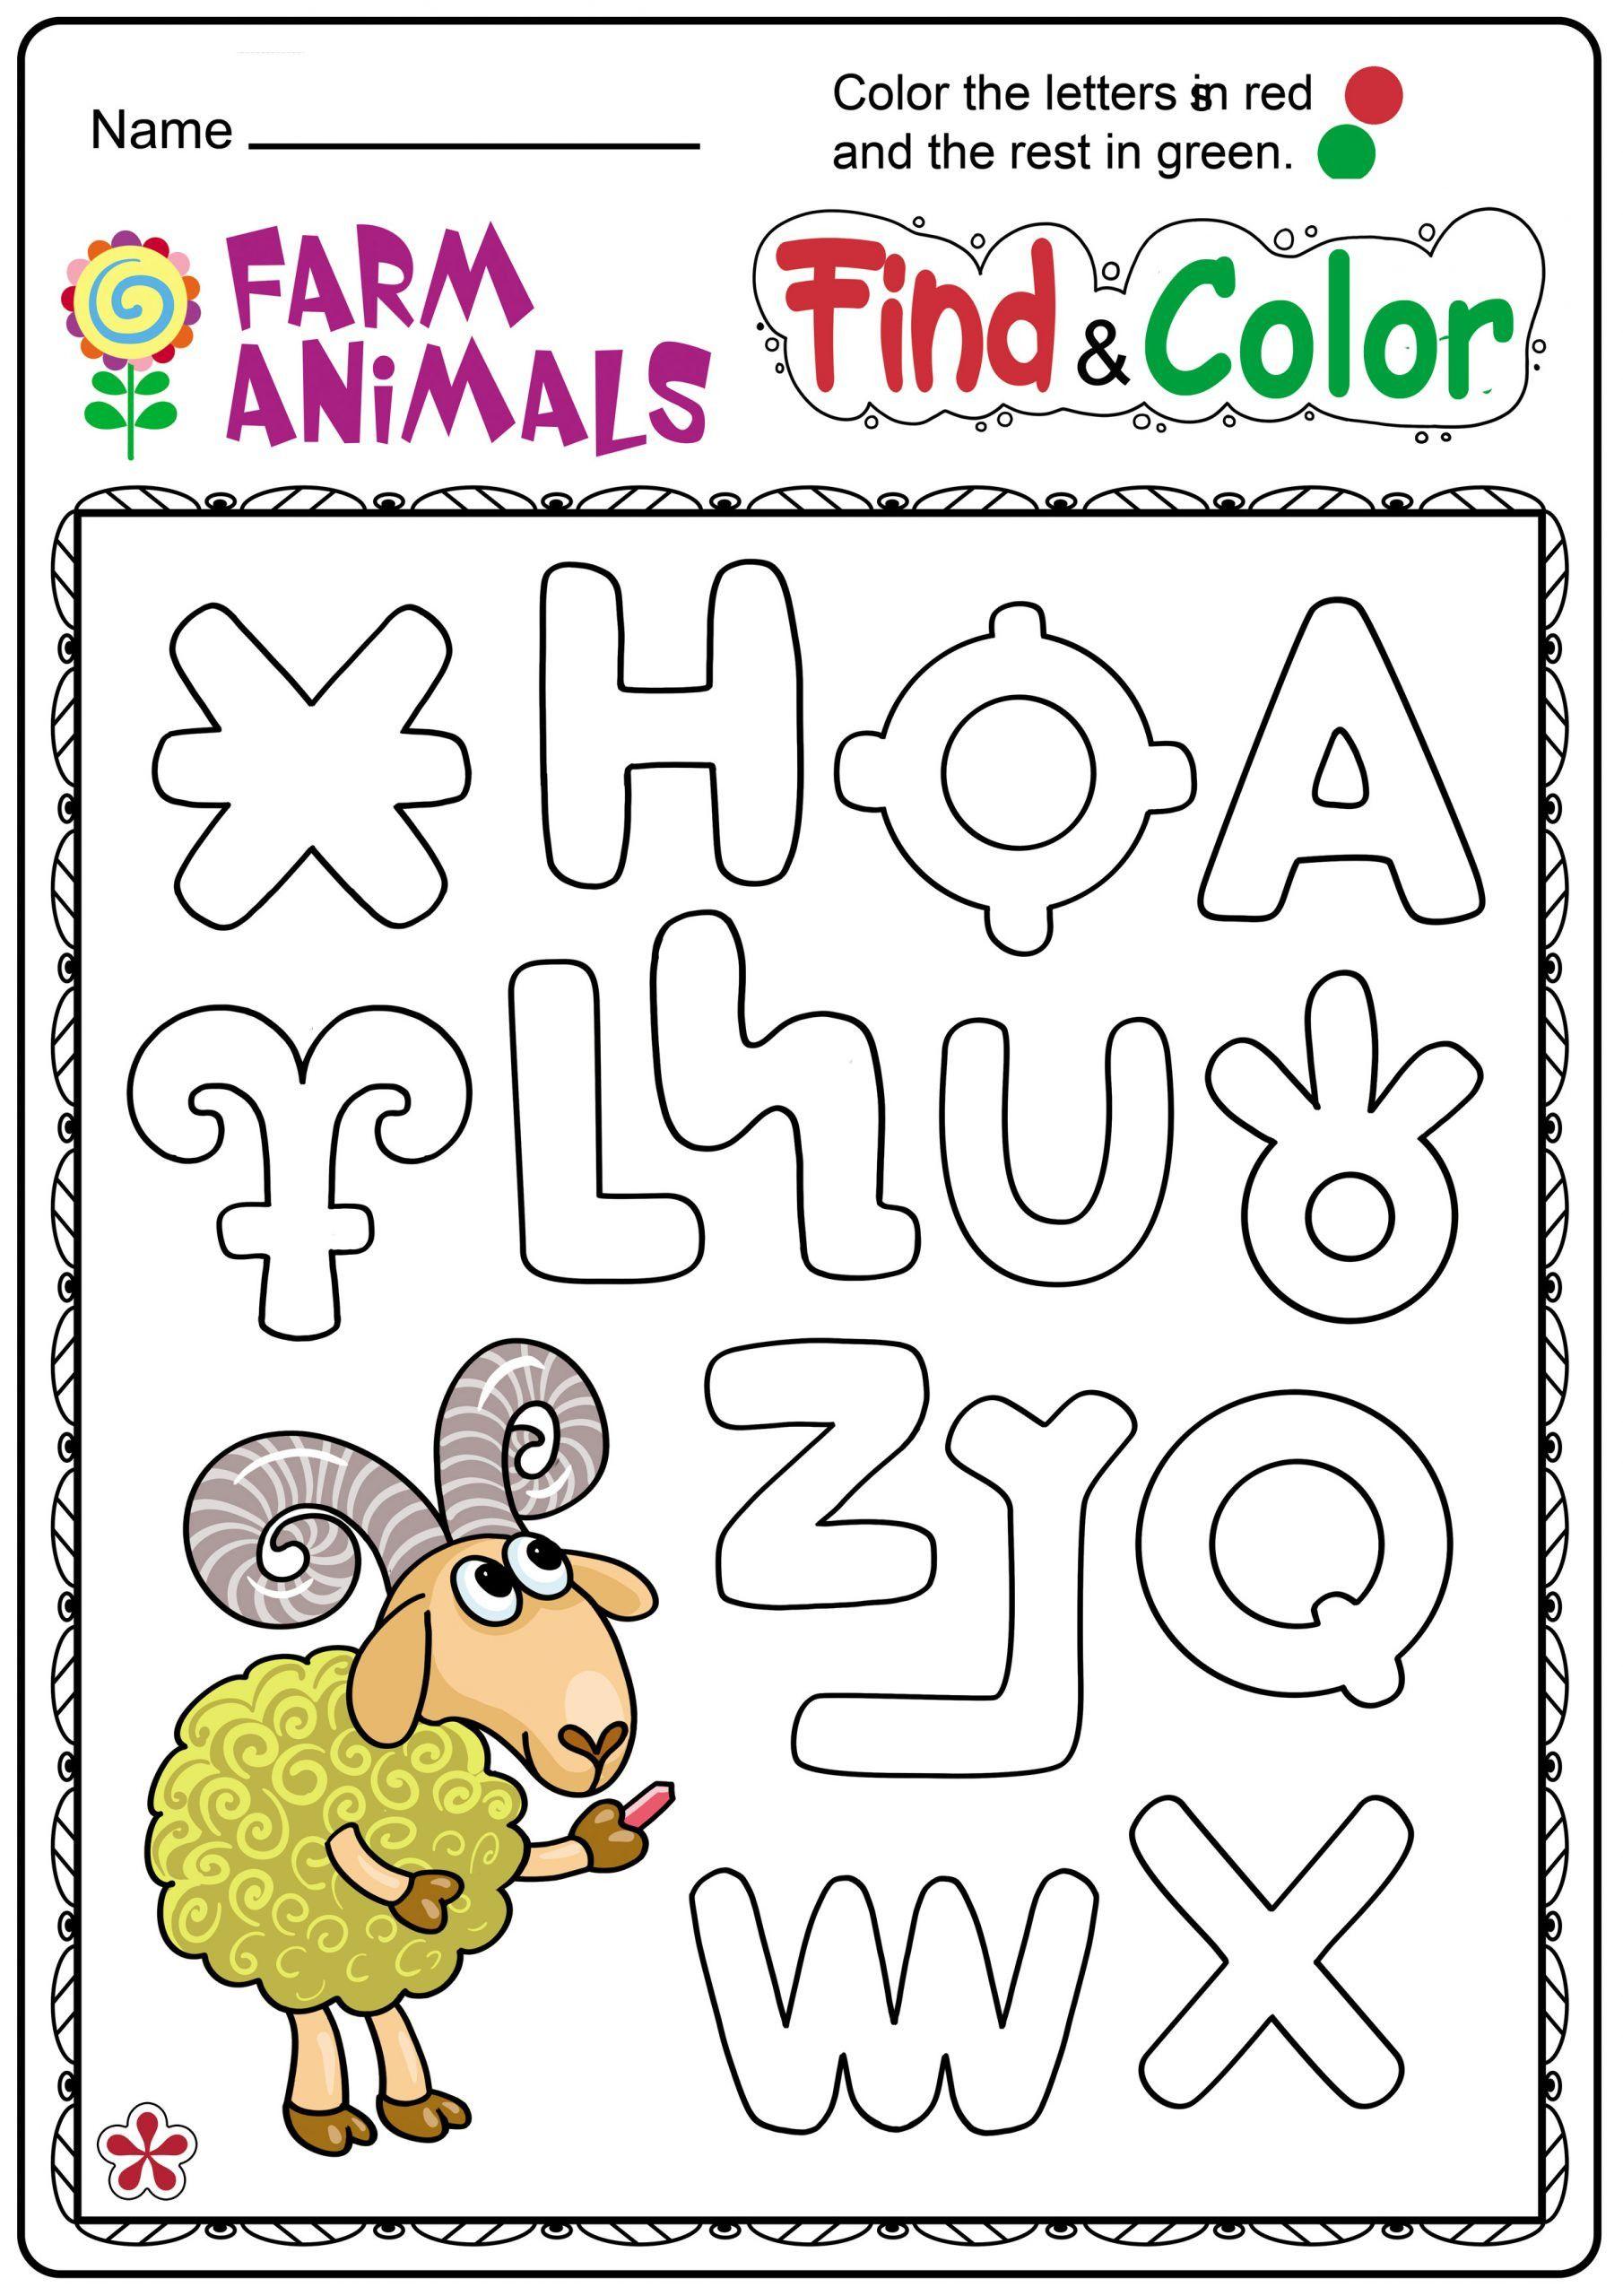 6 Domestic Animals Worksheets Free Printable Farm Animals And Letters Worksheet For Ki Kindergarten Worksheets Animal Worksheets Letter Worksheets Kindergarten [ 2560 x 1810 Pixel ]